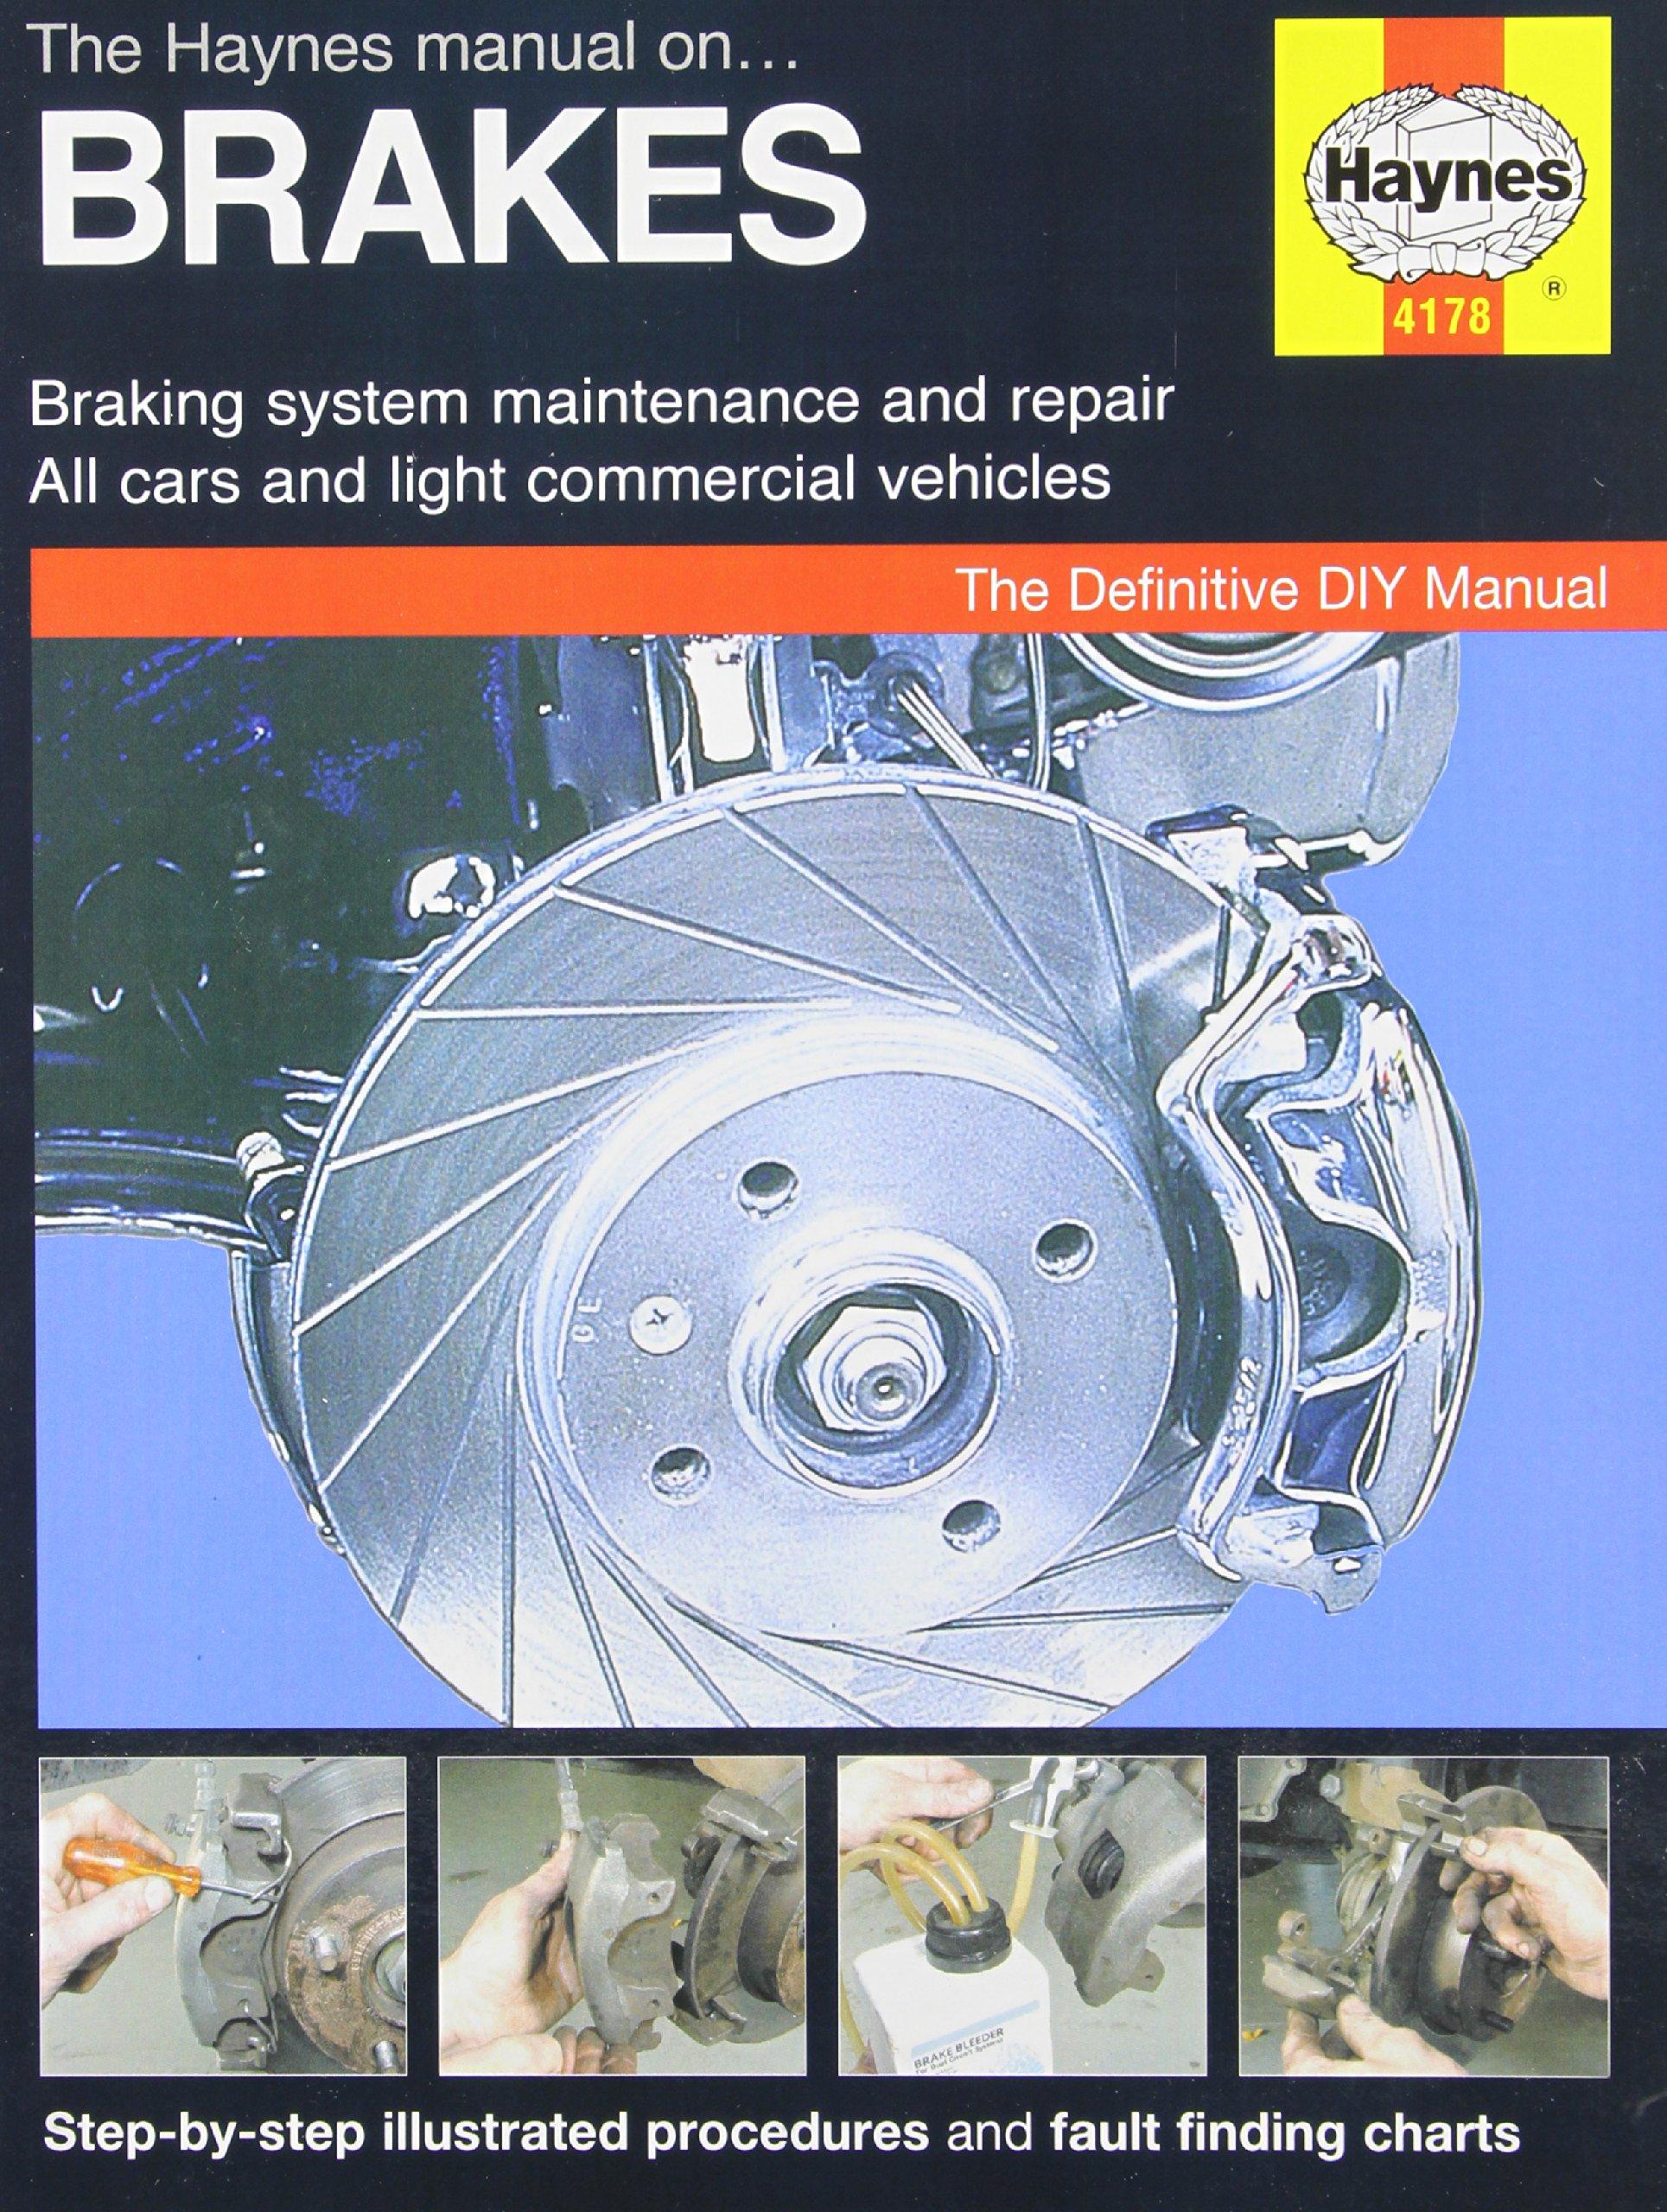 the haynes manual on brakes haynes diy manuals martynn randall rh amazon com haynes brake manual pdf Haynes Manual Monte Carlo Back